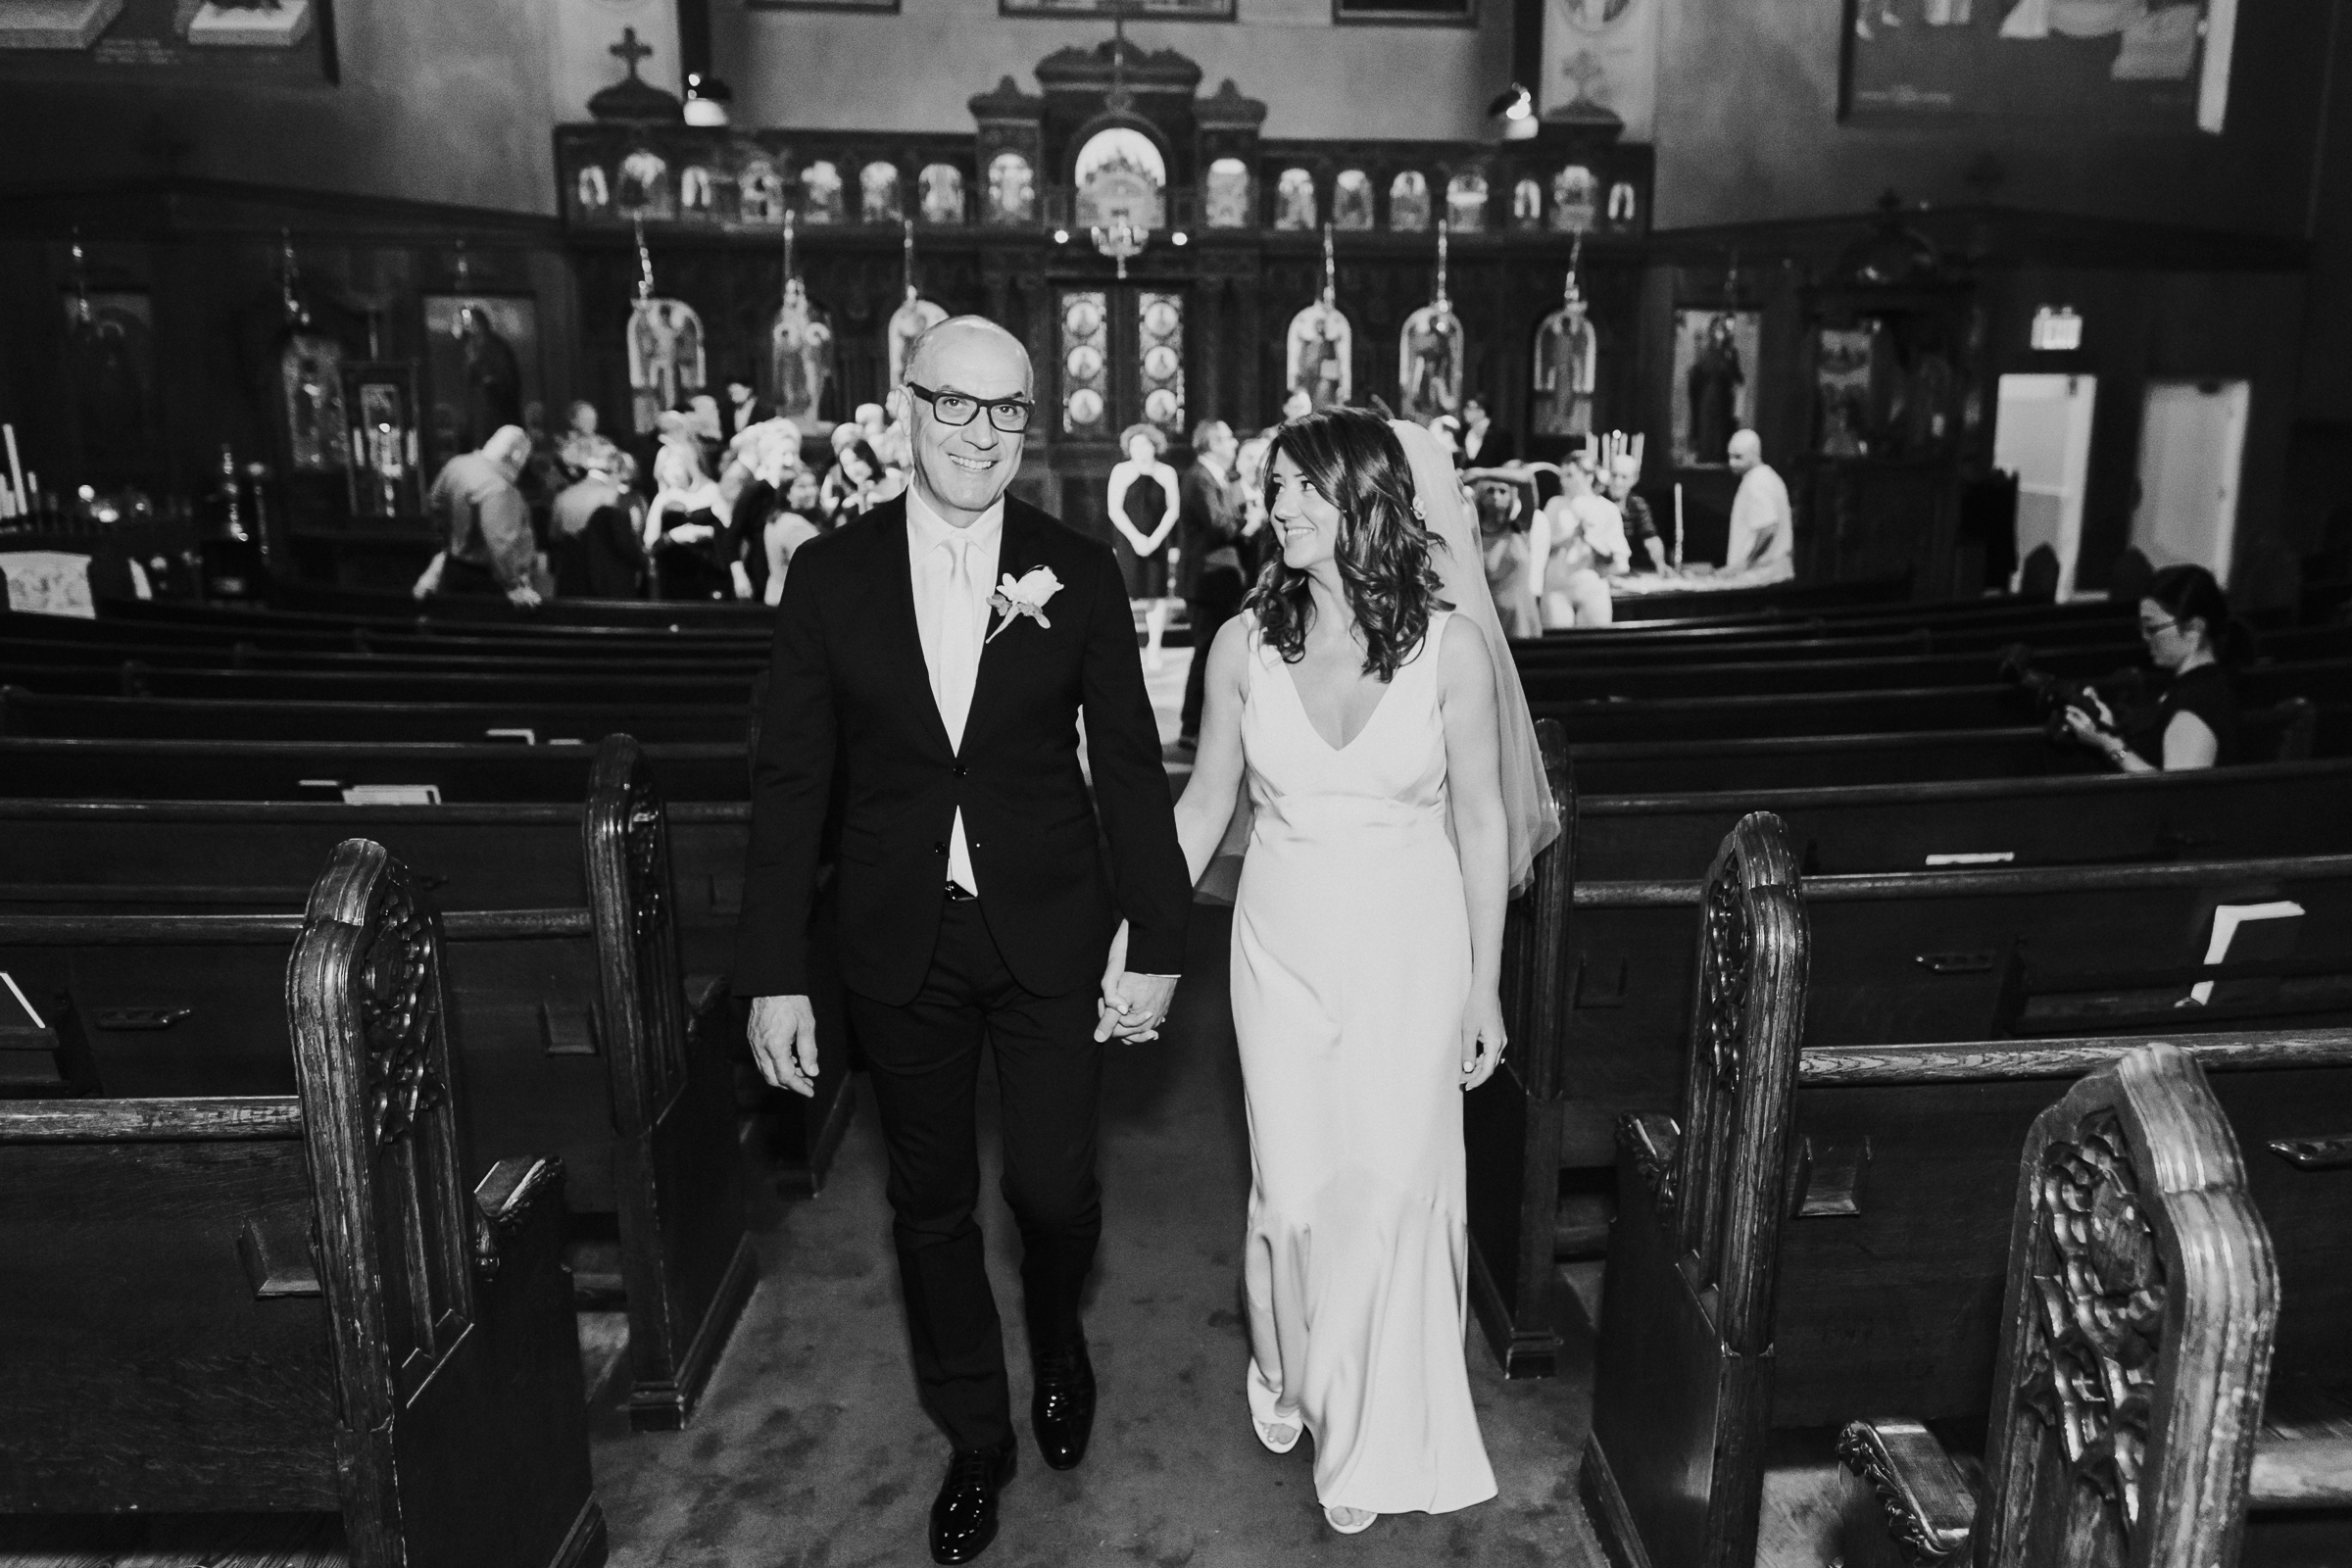 Robert-NYC-Museum-Of-Arts-&-Design-Greek-Italian-New-York-Documentary-Wedding-Photographer-20.jpg